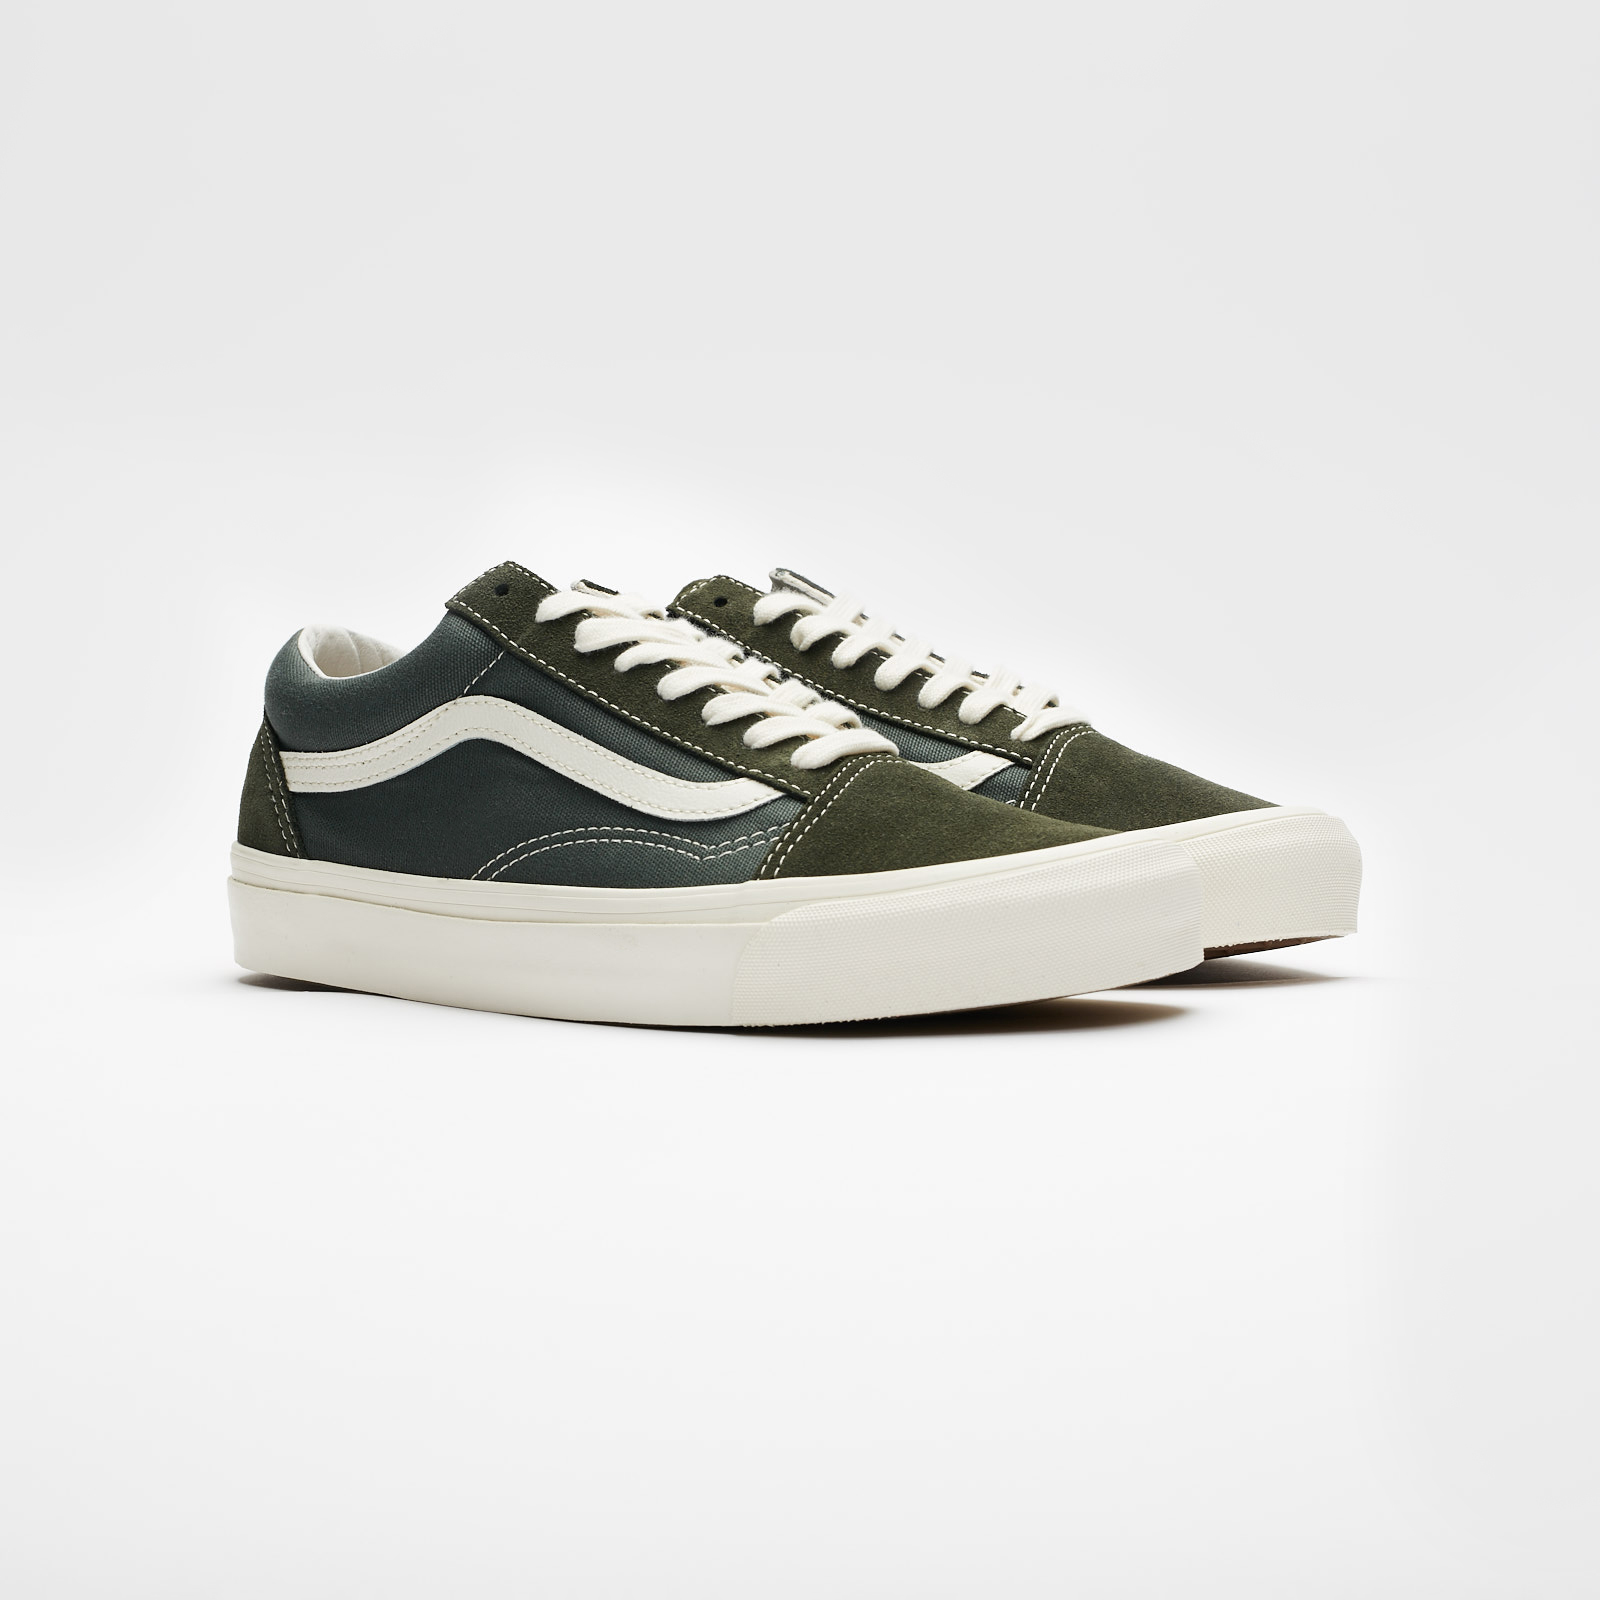 32a4afde29a Vans UA OG Old Skool LX - Va36c8u9q - Sneakersnstuff